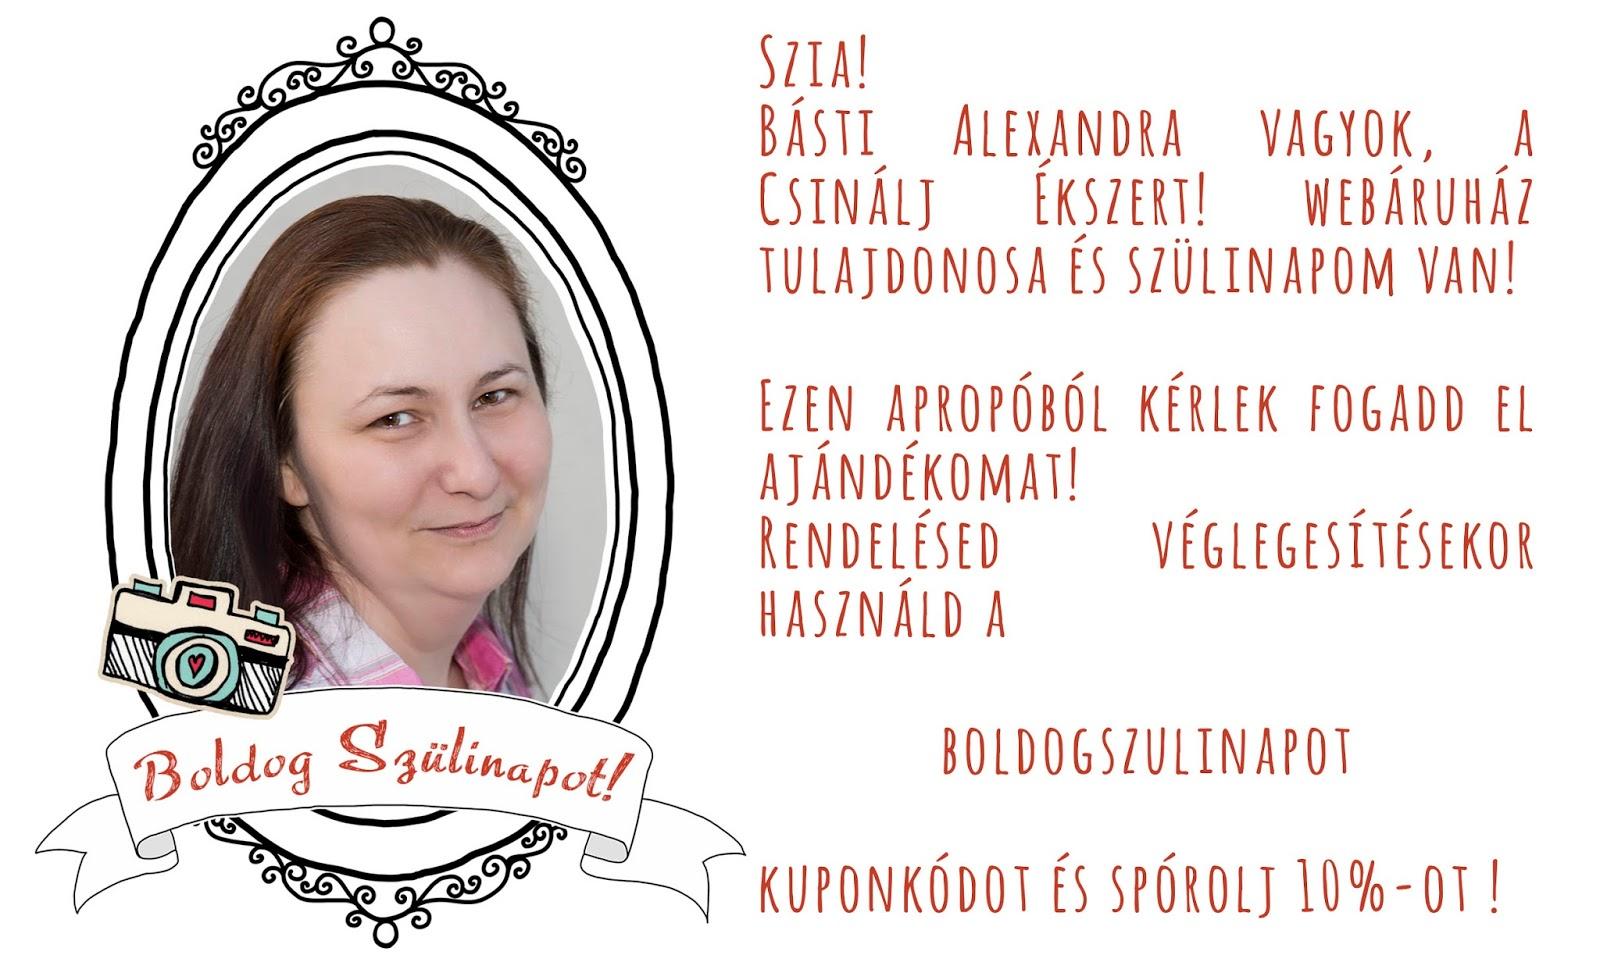 http://www.csinaljekszert.hu